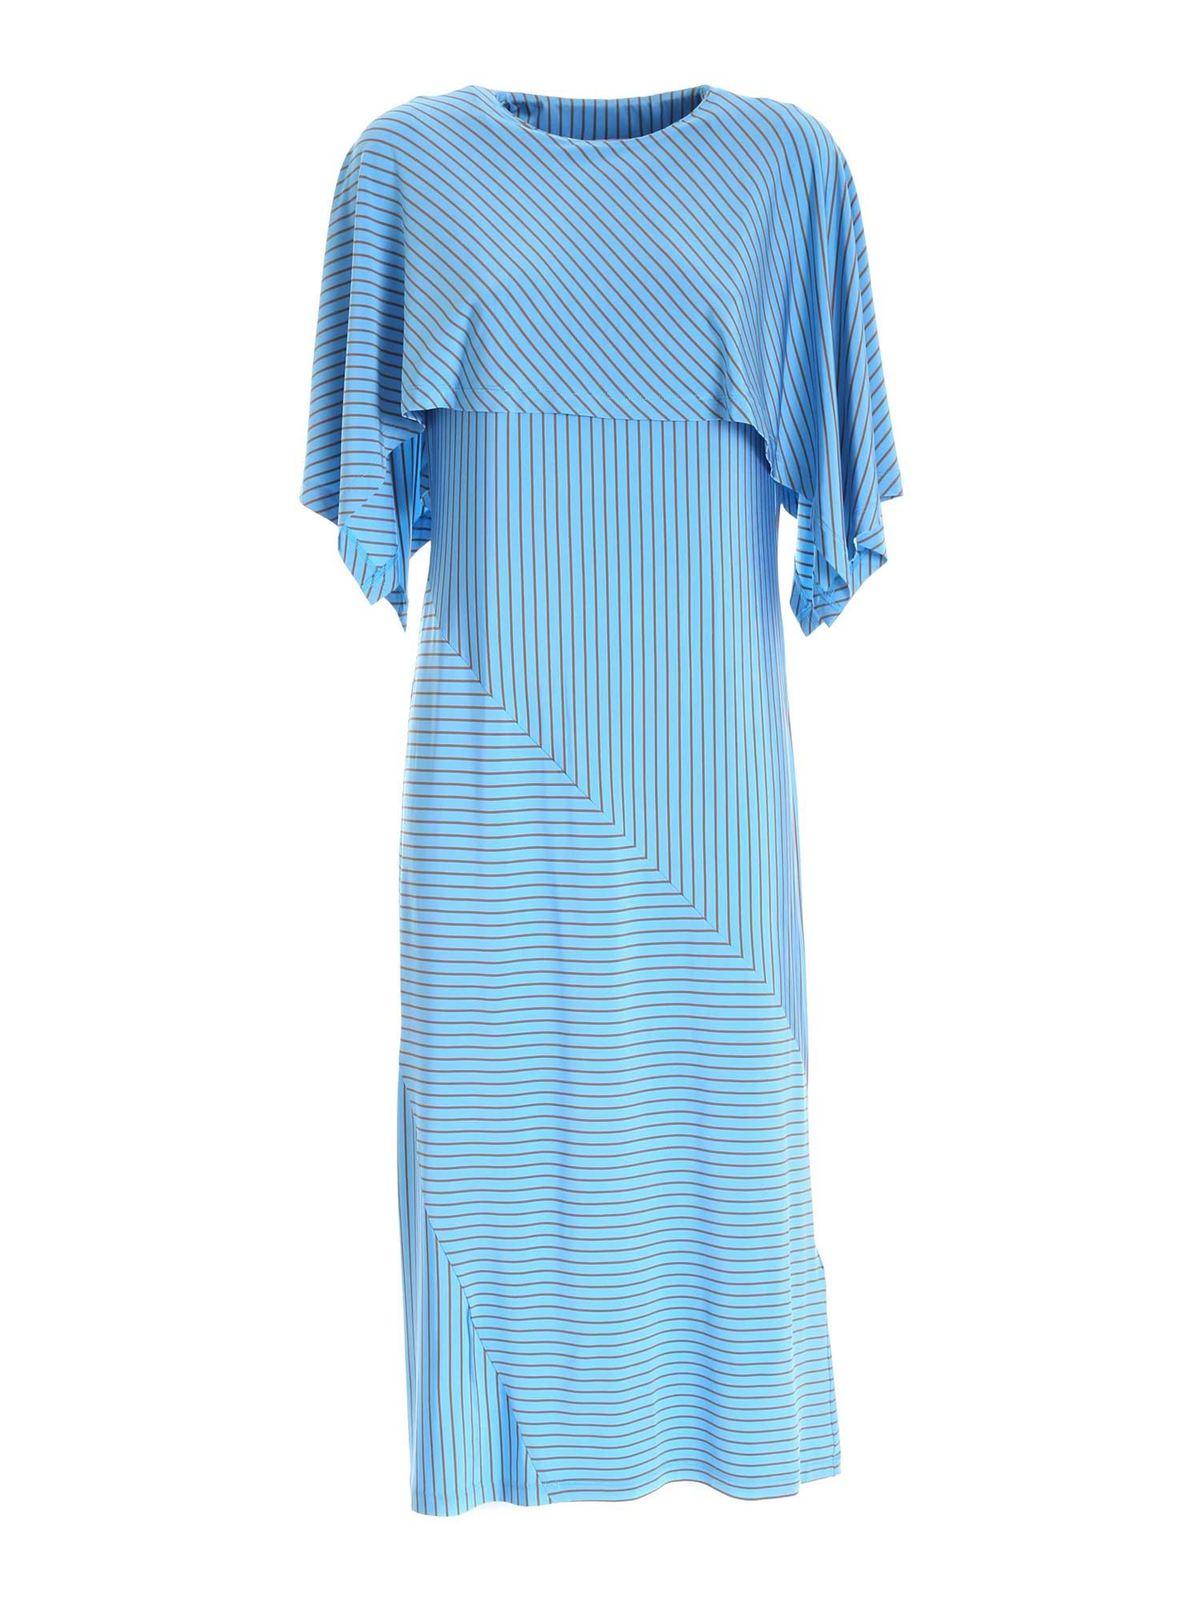 Mm6 Maison Margiela Dresses LONG DRESS WITH STRIPED PATTERN IN LIGHT BLUE